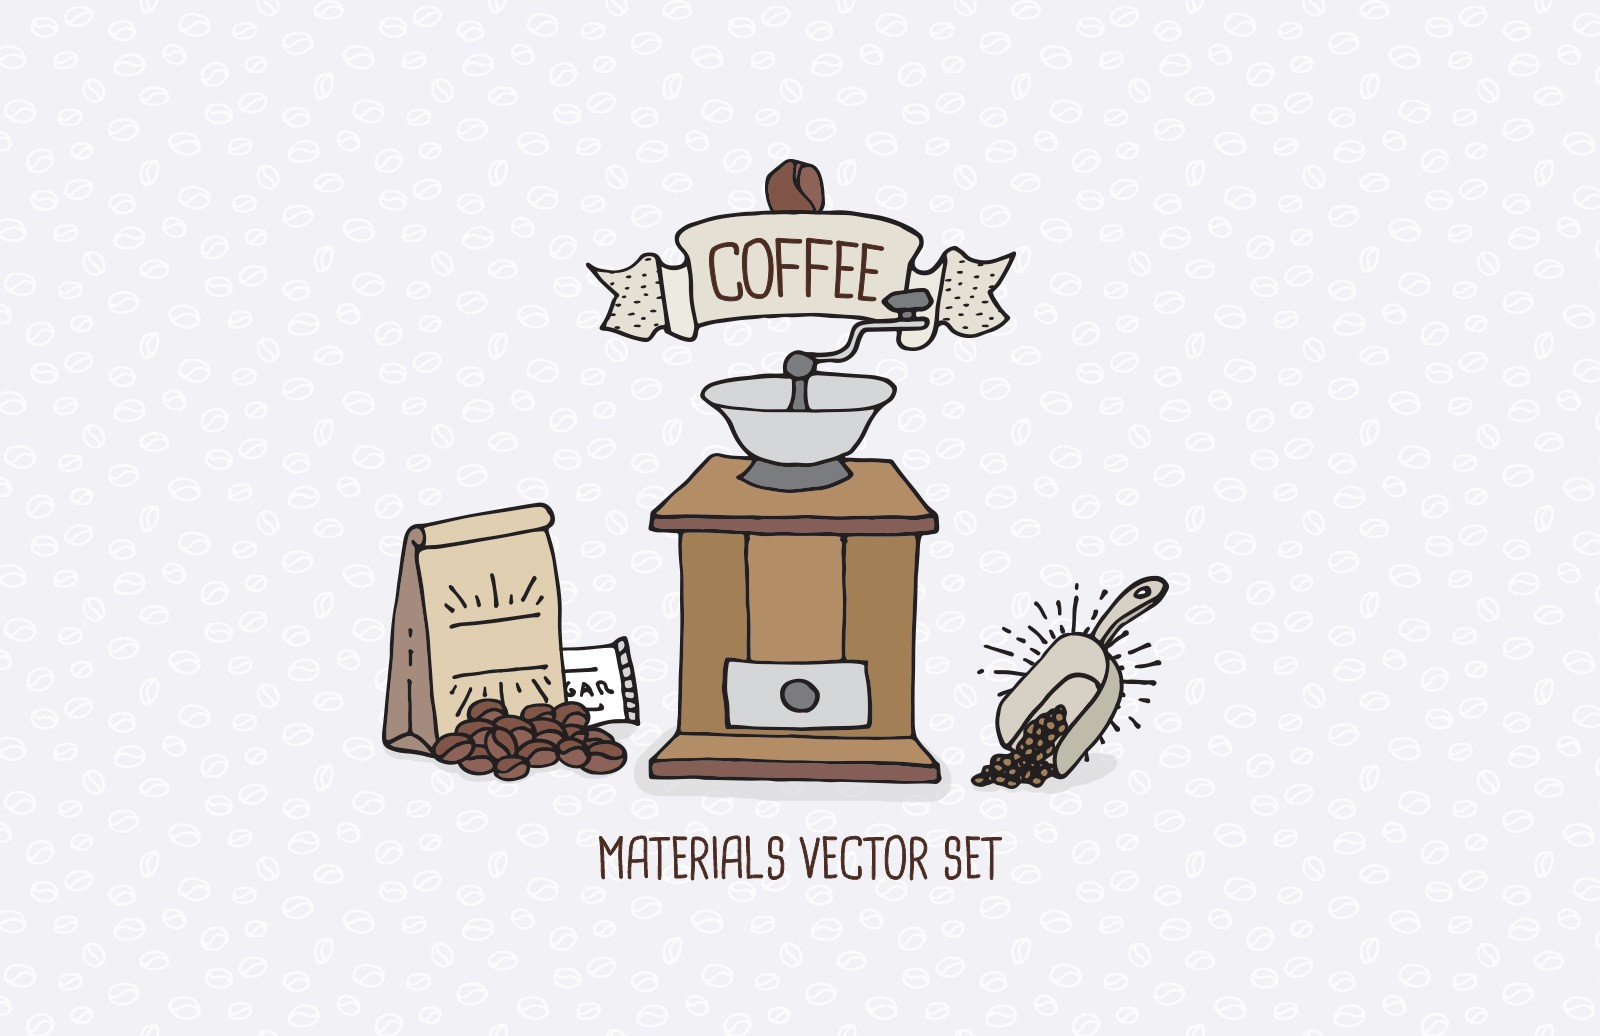 Coffee Shop Materials Vector Set Preview 1